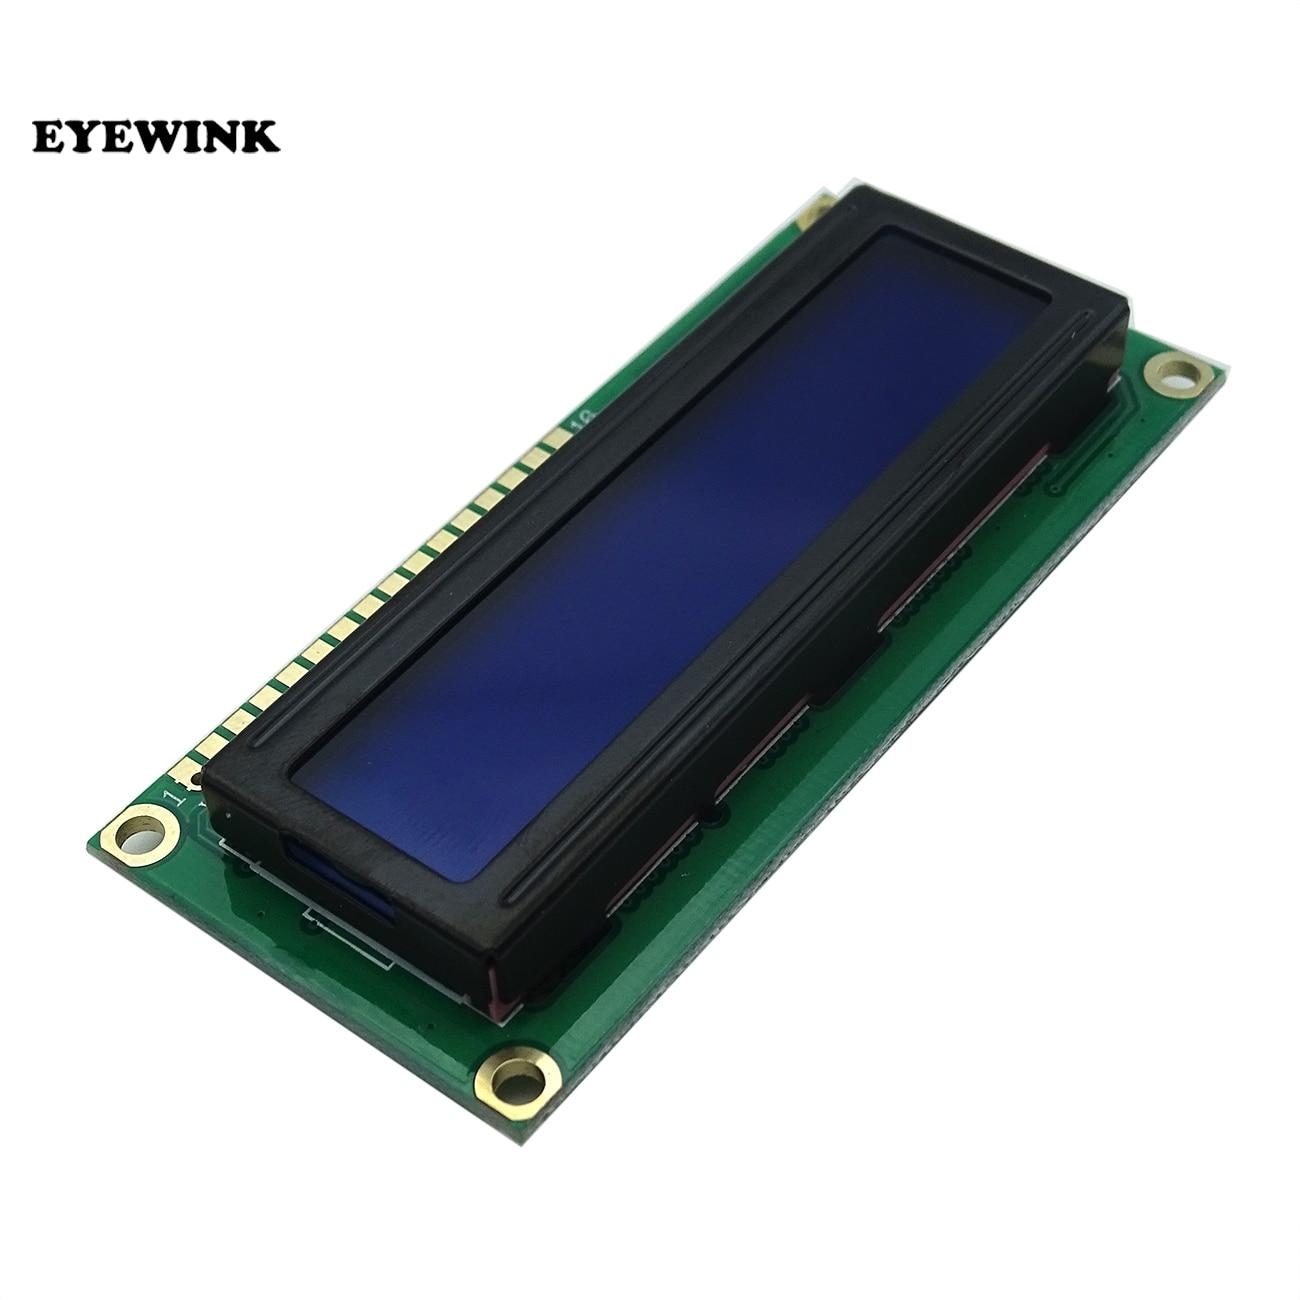 Free Shipping 50PCS LCD1602 1602 module Blue screen 16x2 Character LCD Display Module HD44780 Controller